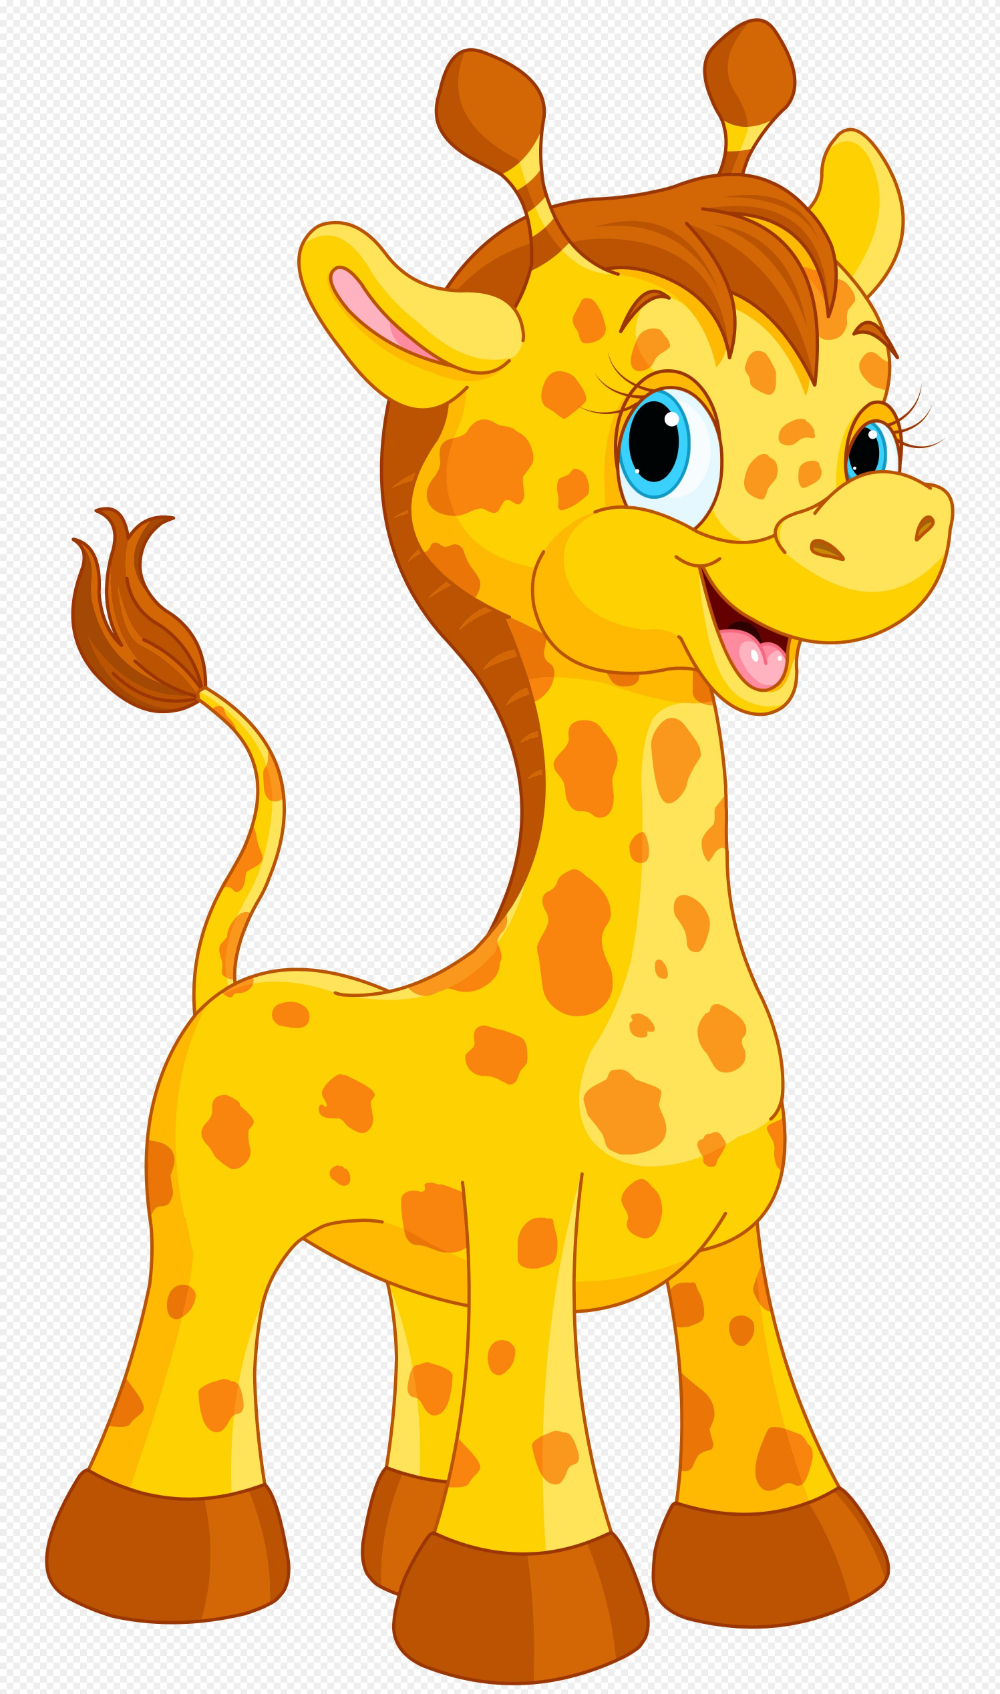 Giraffe Cartoon Png Cute Giraffe Cartoon Png Clipart Image 2994 5074 Png Download Free Transp Multiplikacionnye Risunki Detskie Risunki Milyj Multfilm